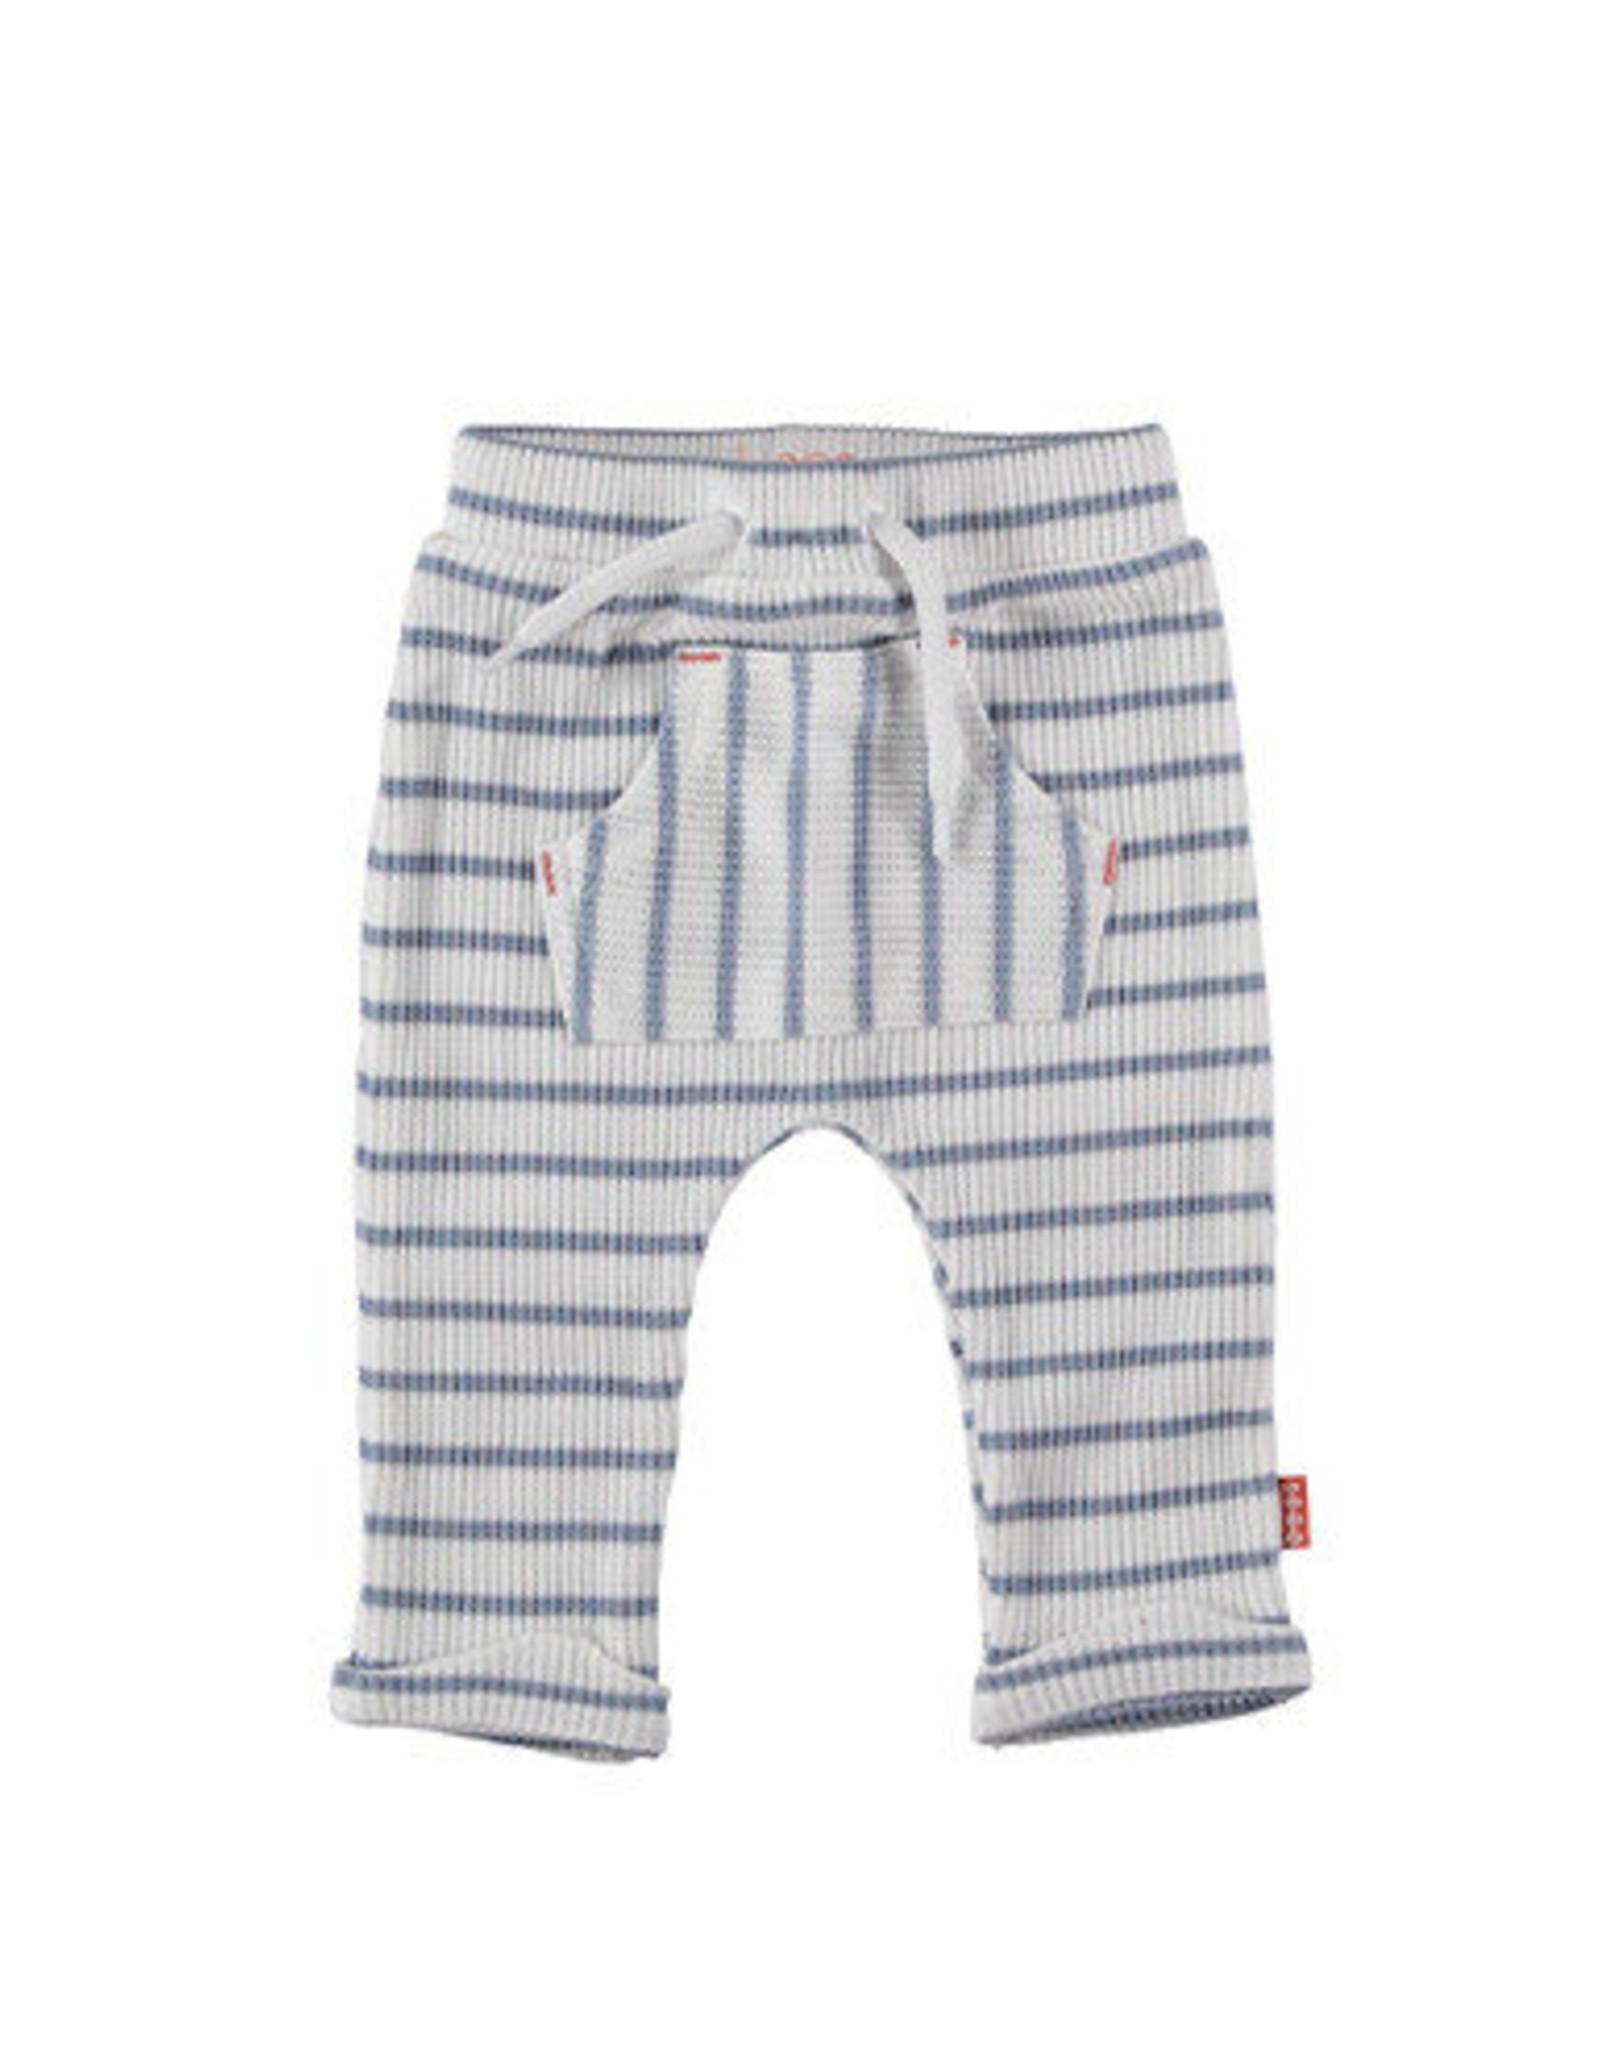 B.E.S.S. Pants Striped, Dessin